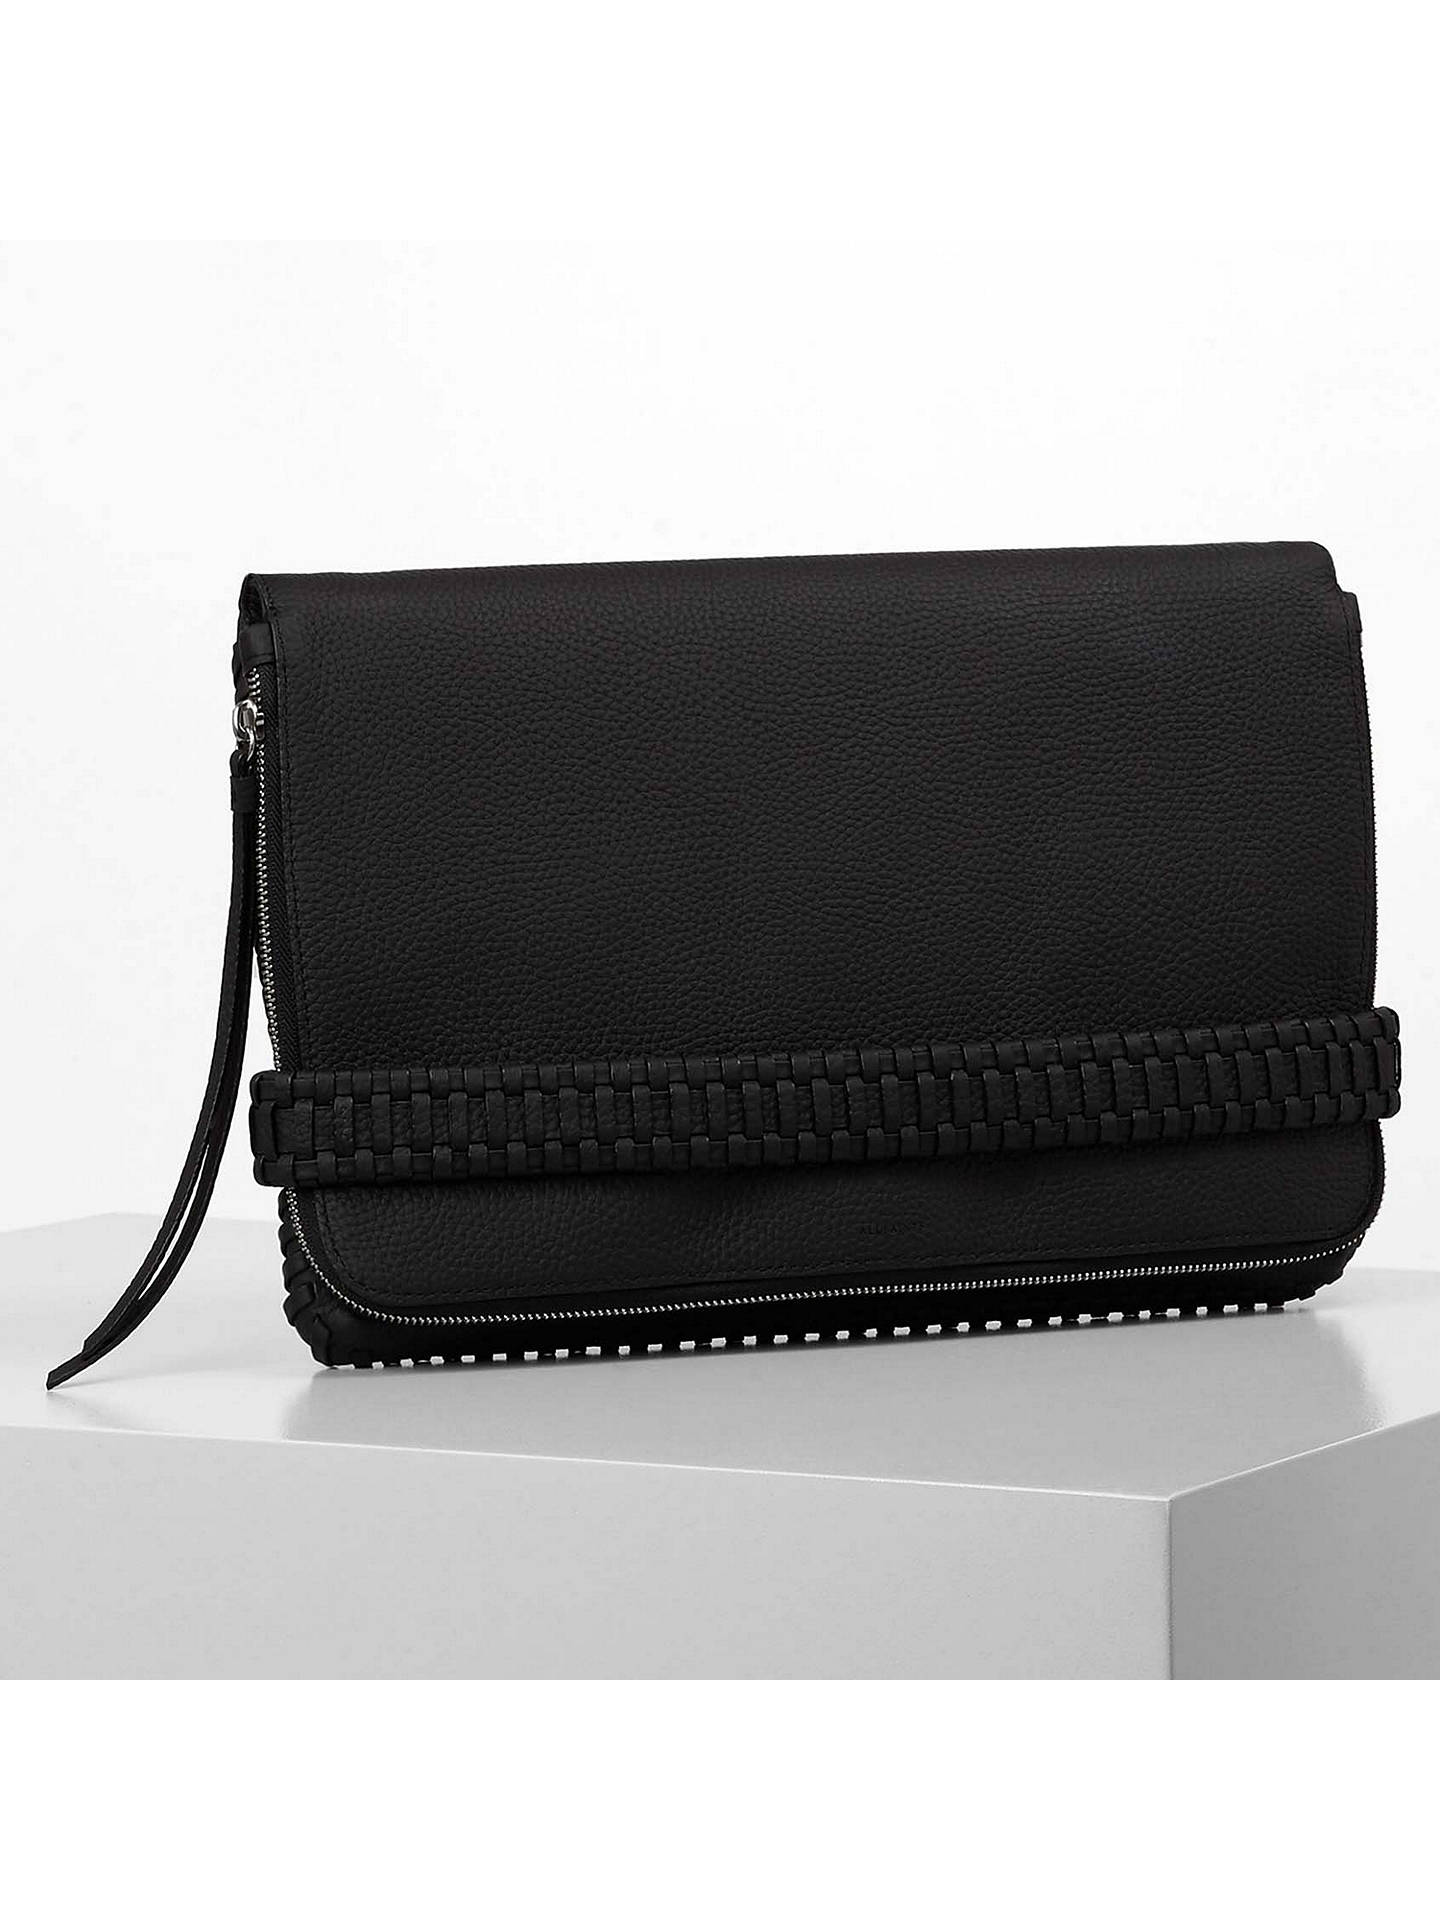 4e31cf2842 ... Buy AllSaints Club Large Clutch Bag, Black Online at johnlewis.com ...